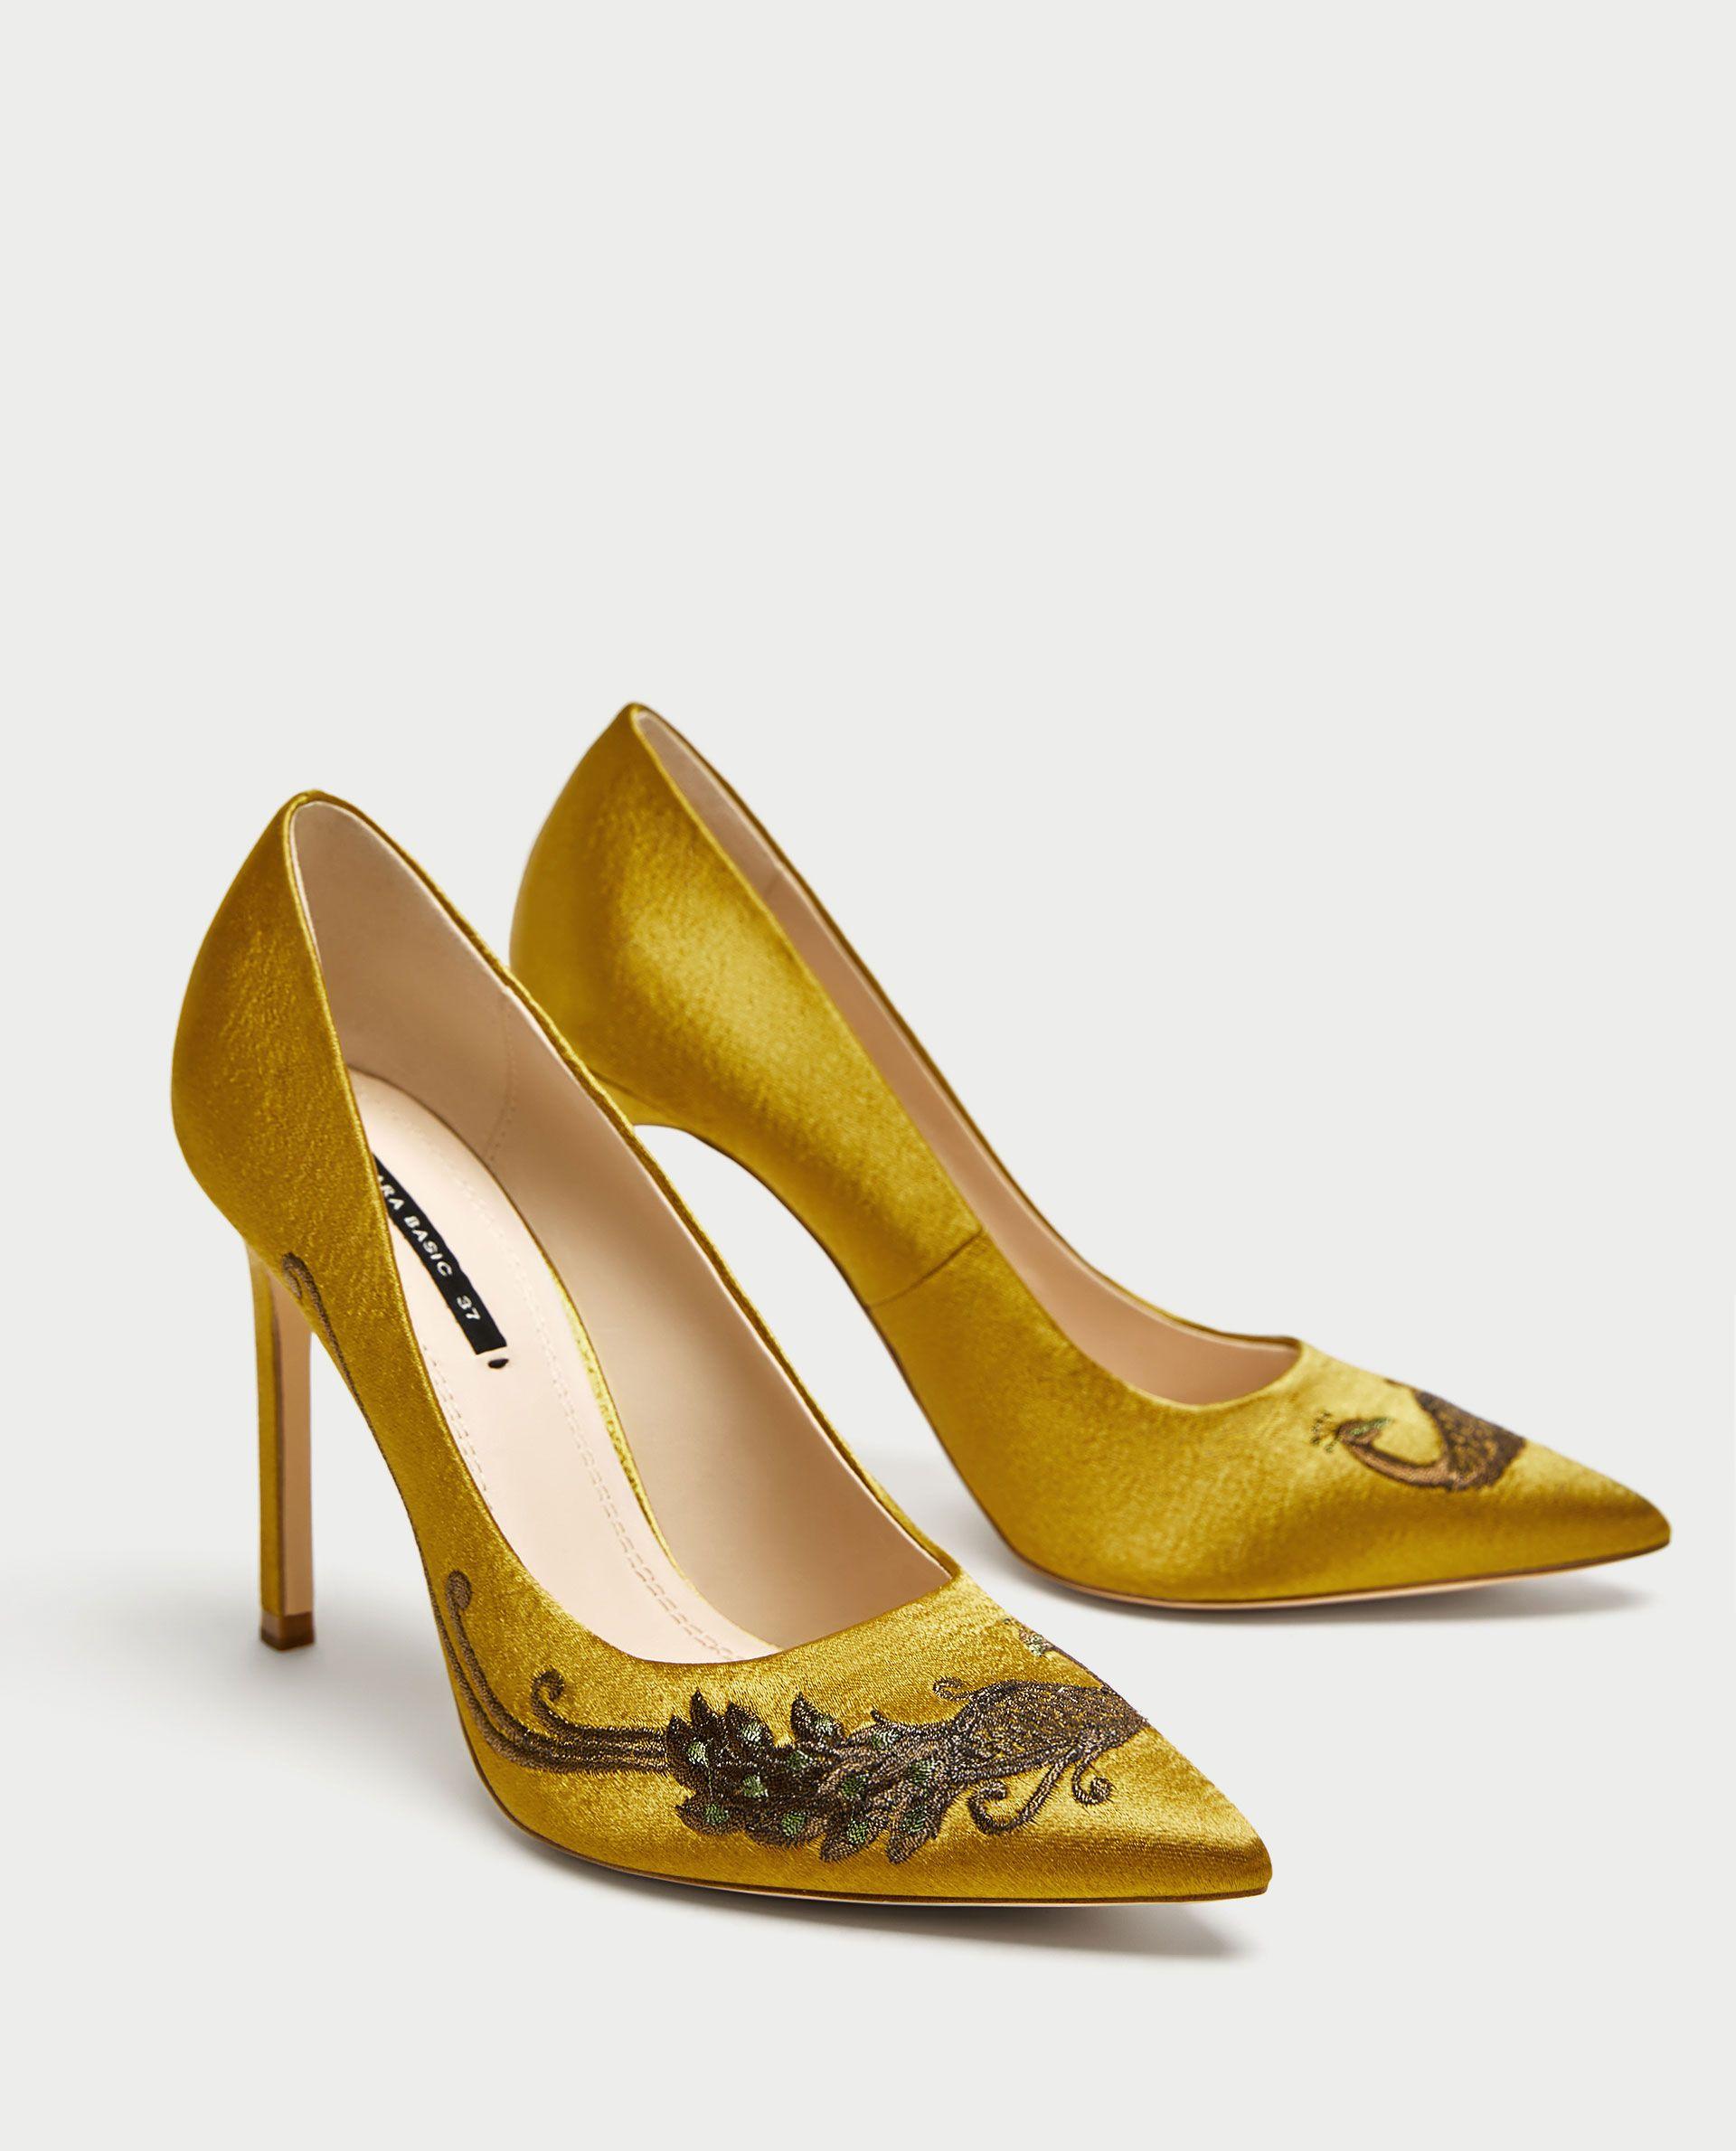 Abalorios Zara 2017 Salón En Raso 2019 Bordado Wishlist Ow 4qq8SnYx